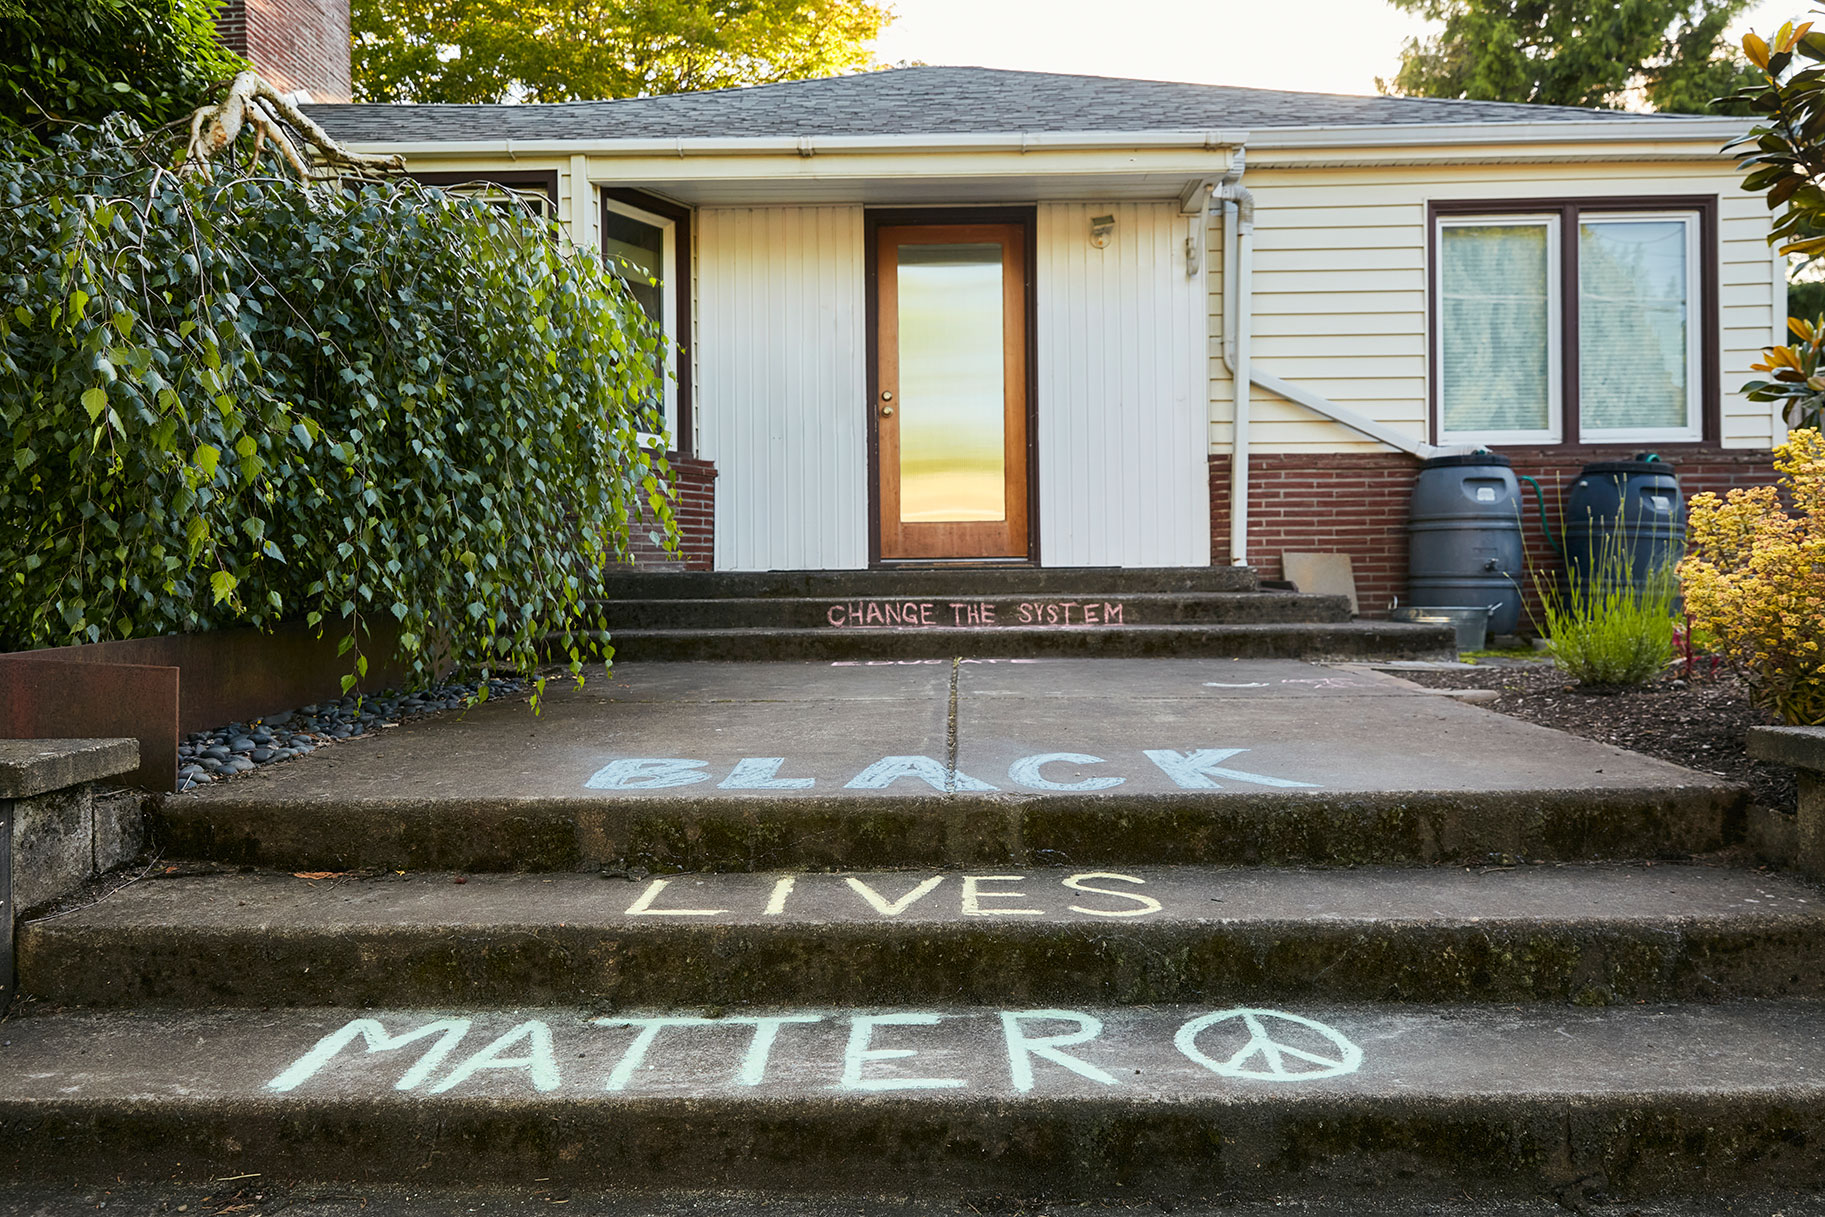 California 'Karen' Minta Maaf, Suami Dipecat, Setelah Memanggil Polis Mengenai Lelaki yang Menulis 'Kehidupan Hitam' Di Luar Rumah Sendiri